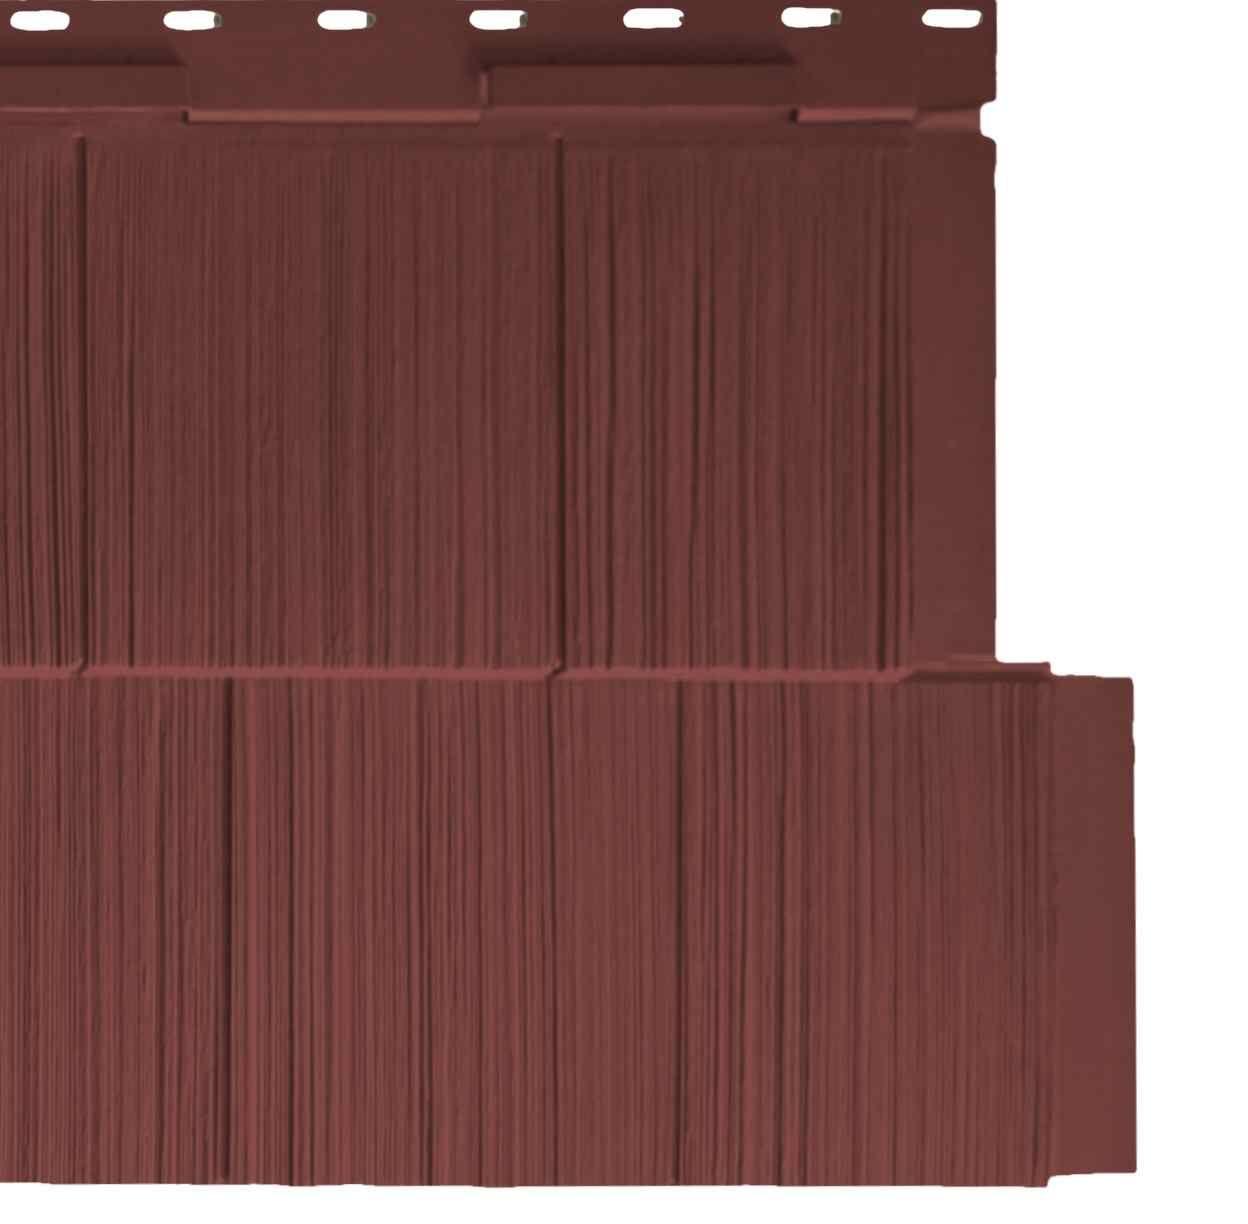 Colour Prestige Beige Perfection Shingles Kaycan Siding Stone Cladding House Shingling